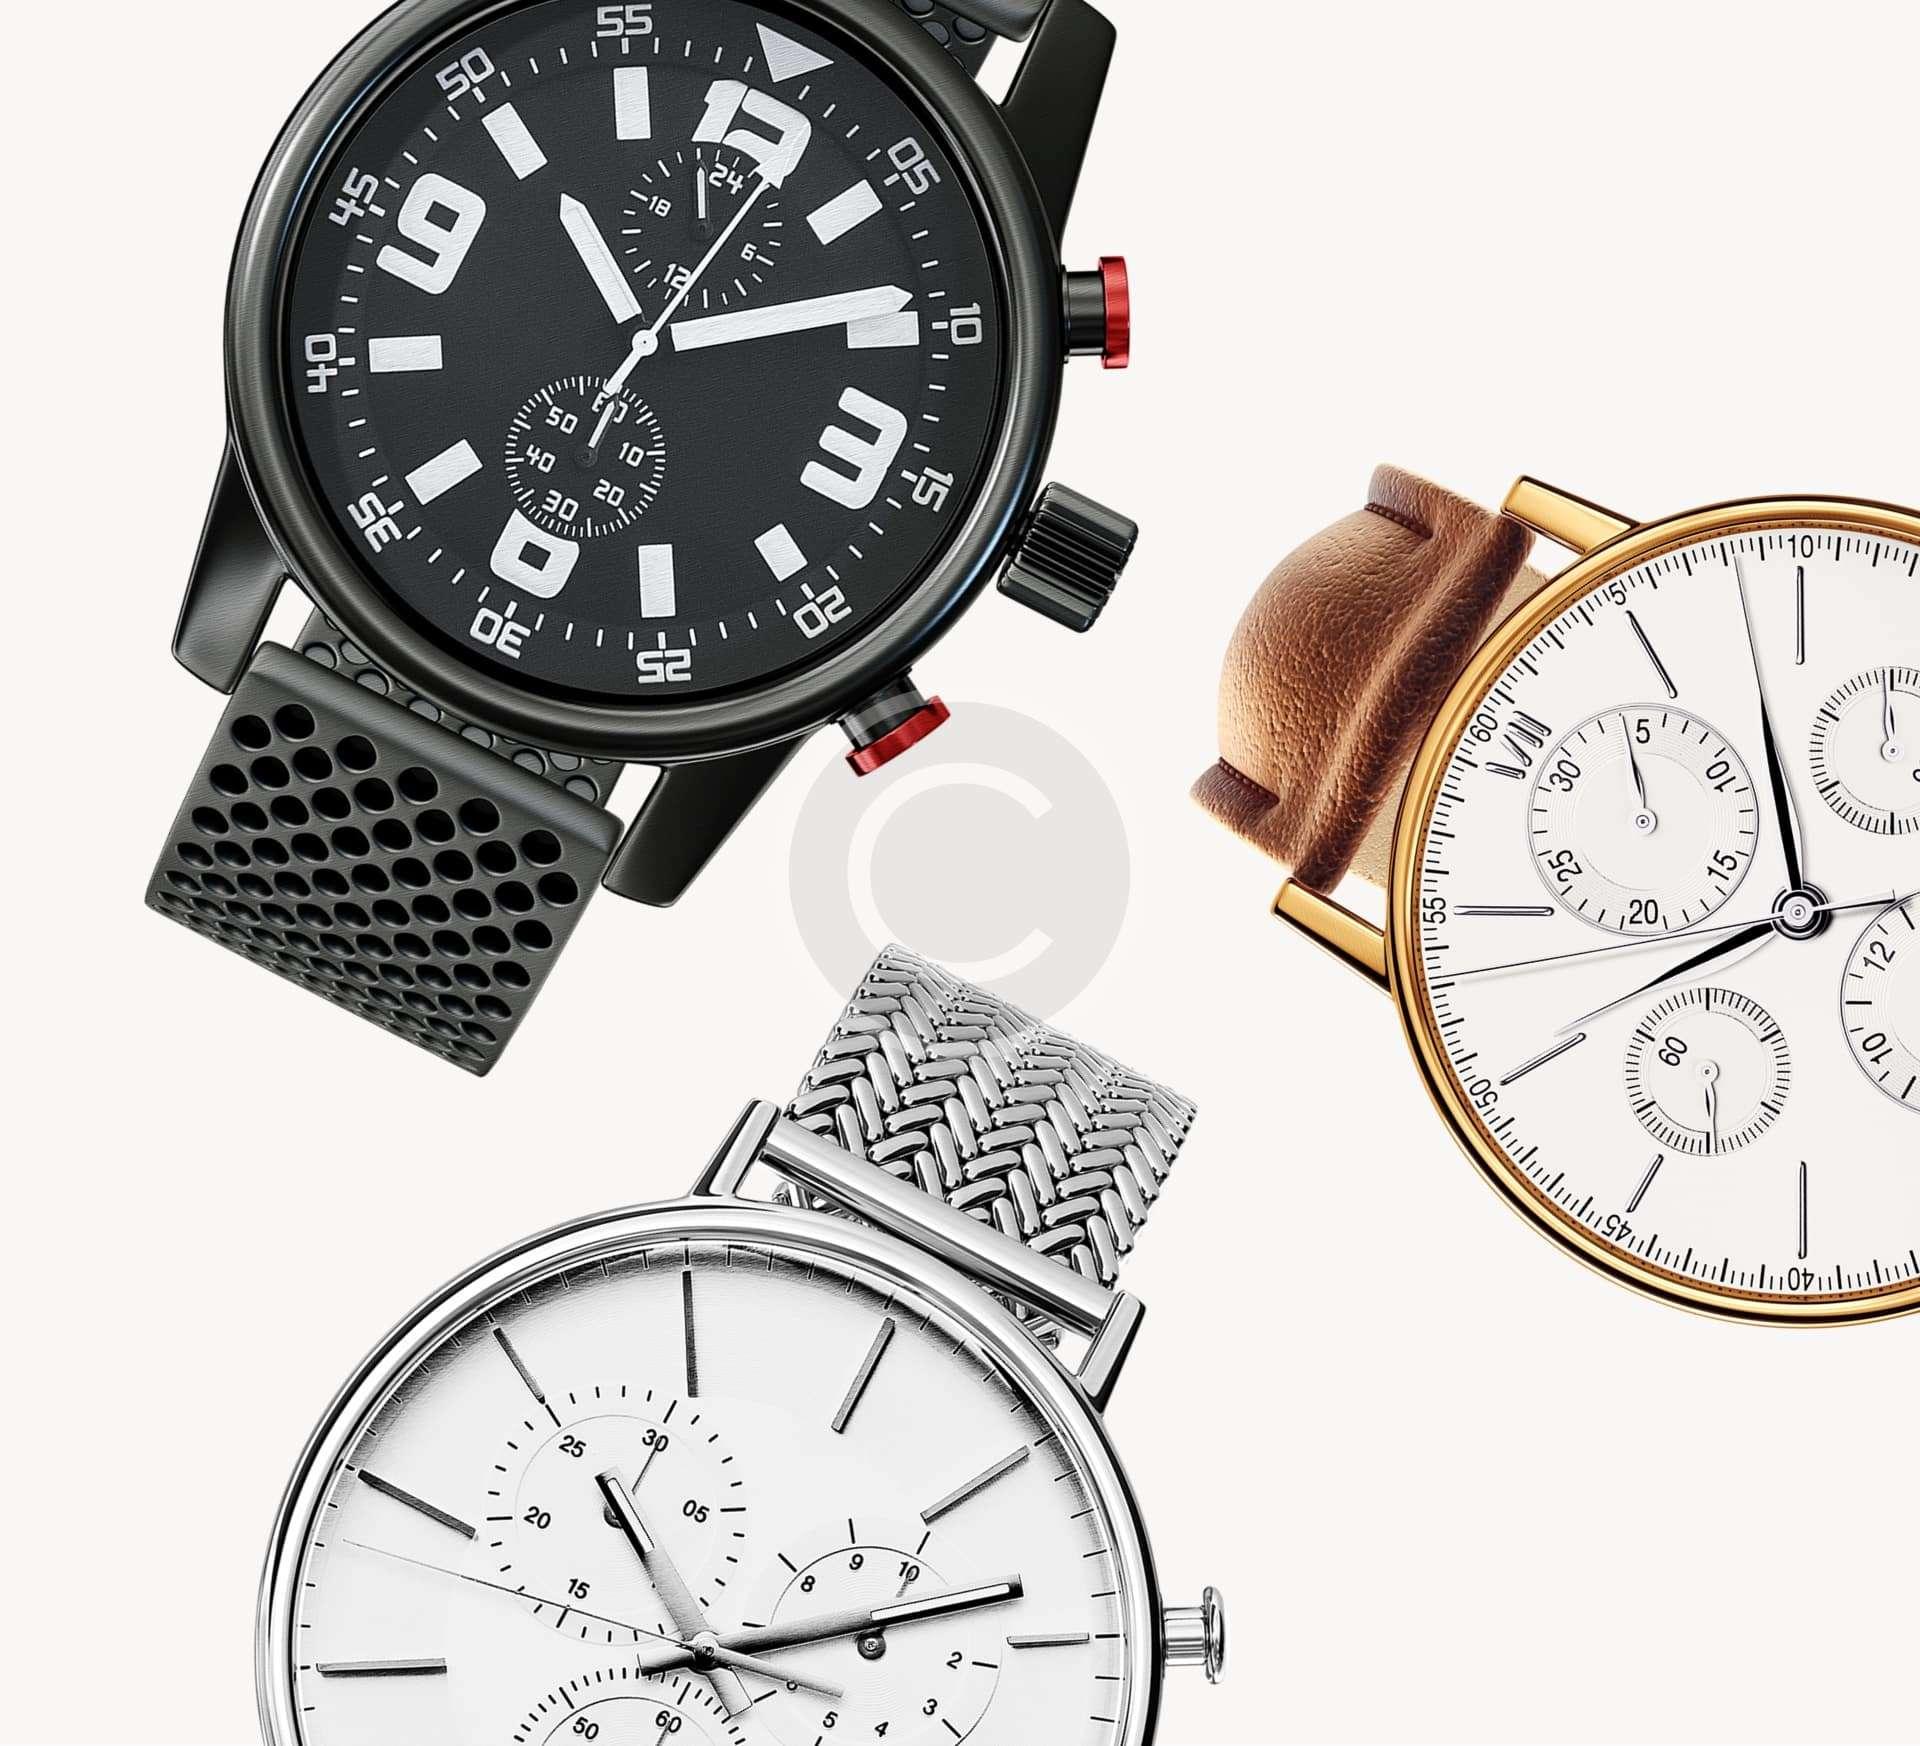 Proper Watch Maintenance Services